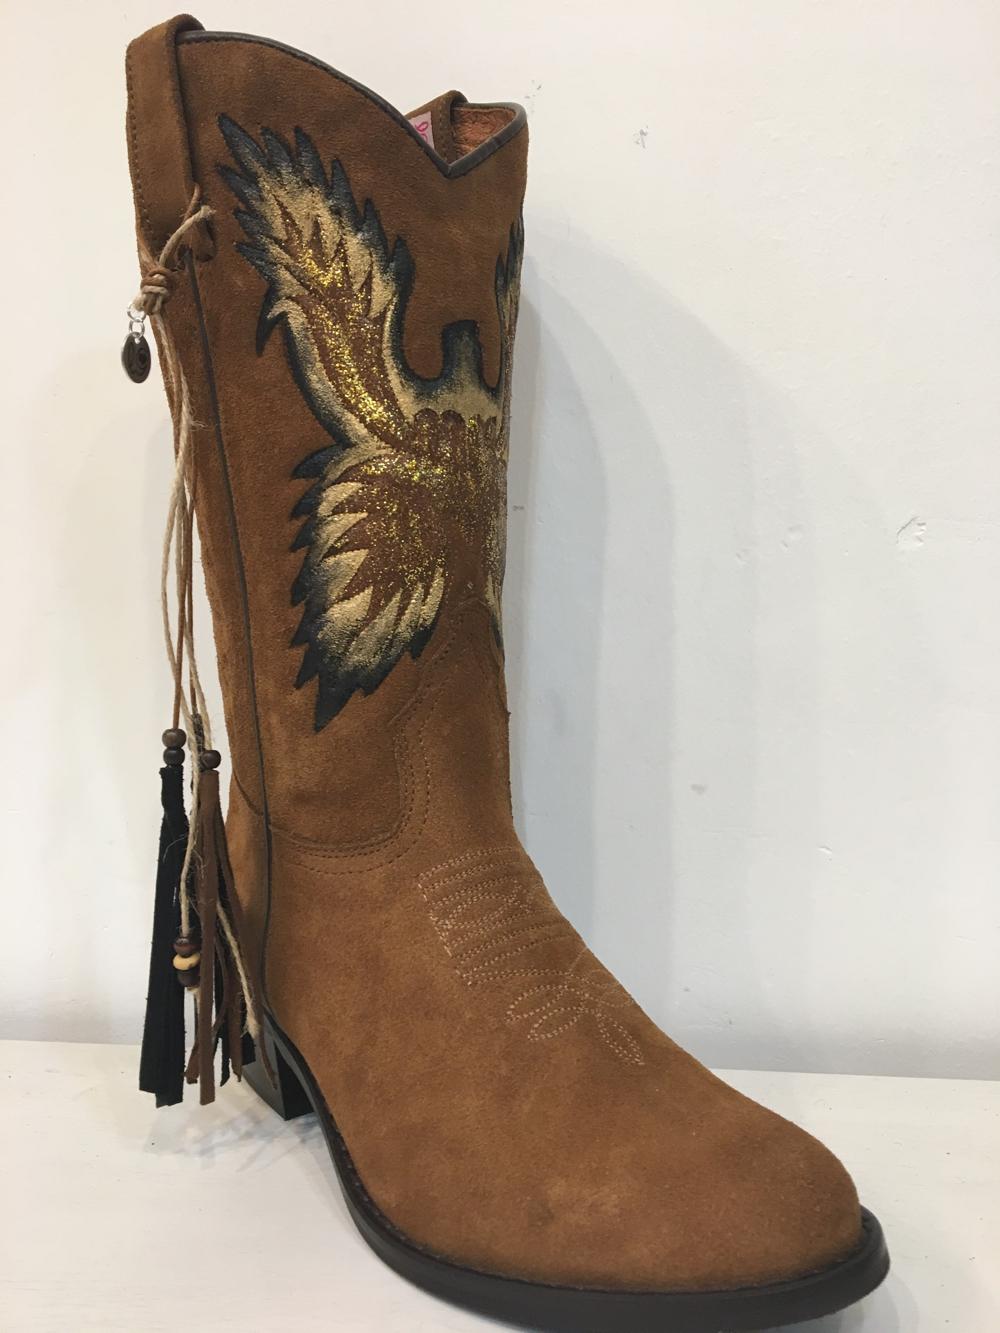 Boots Eagle Boots Boots Eagle Boots Eagle Eagle Boots Eagle Boots Eagle zwqpBPv